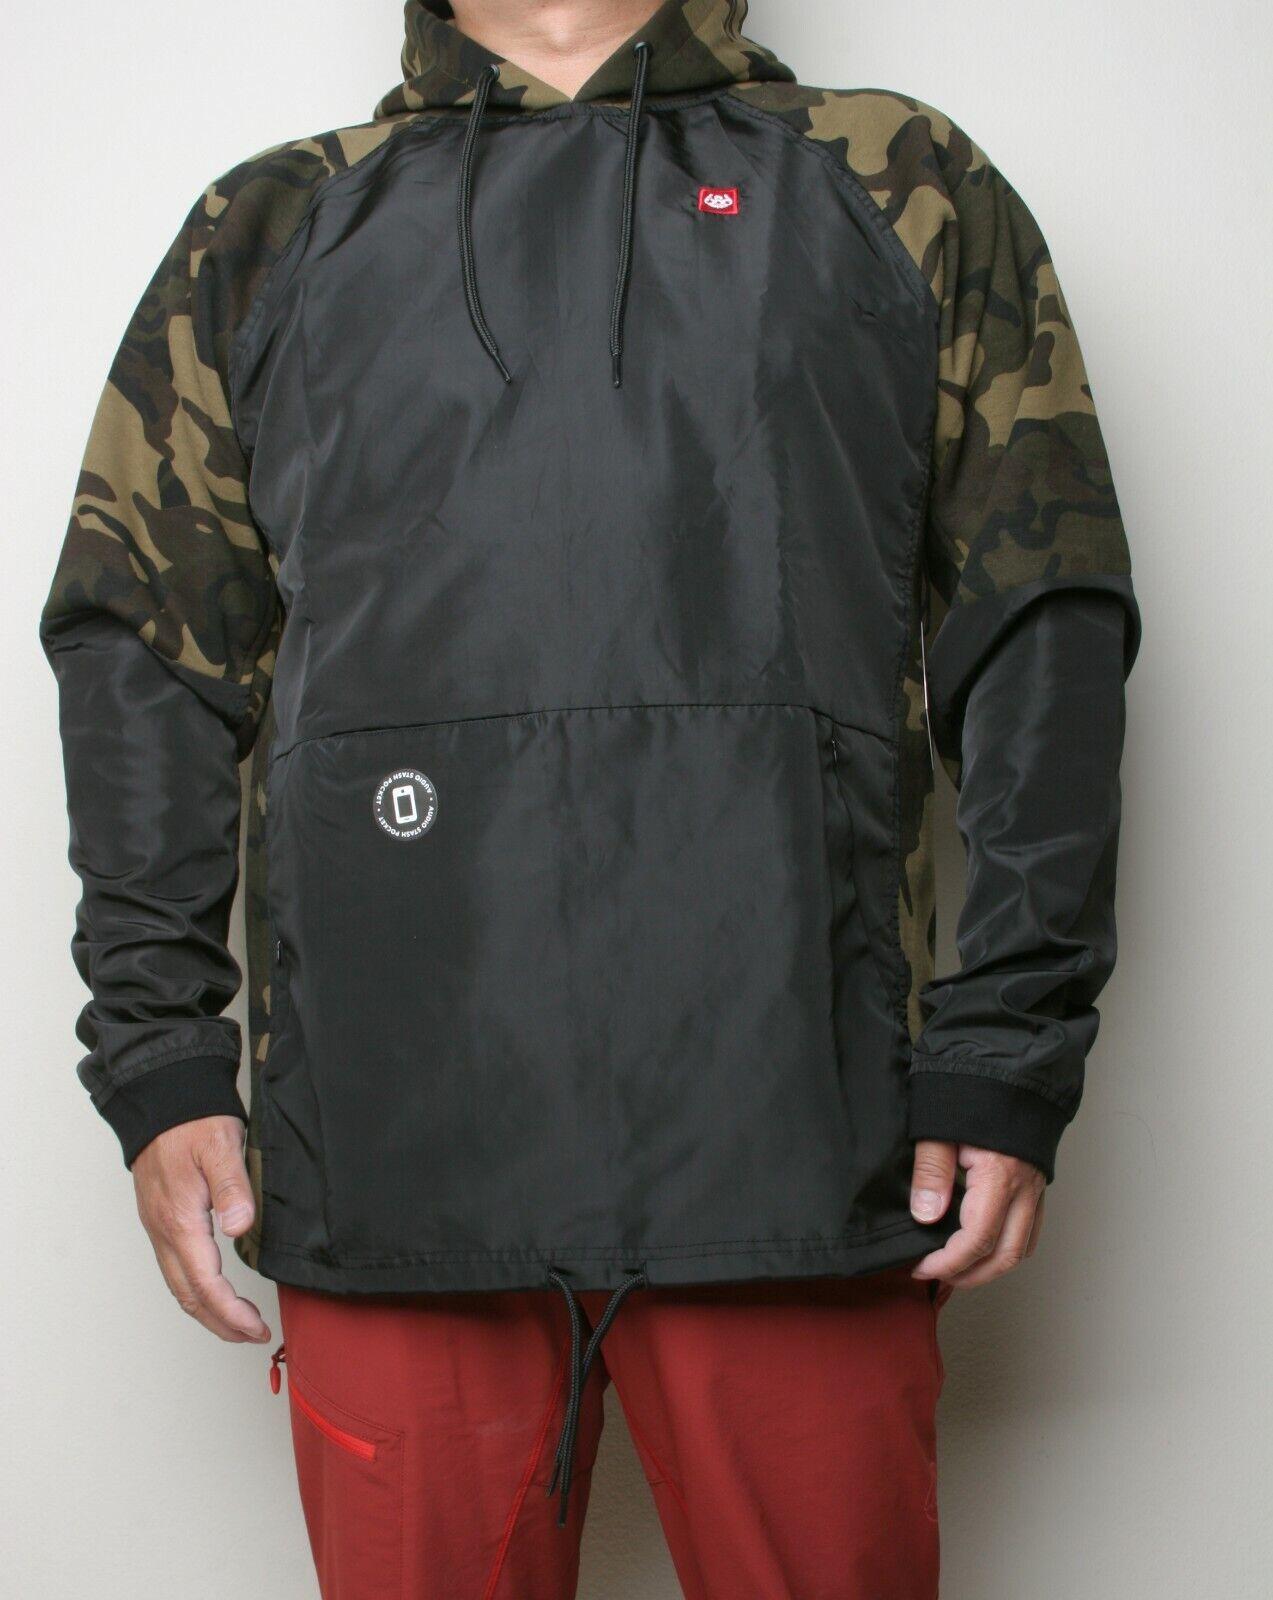 686 Hybrid Fleece Pullover Hoody (L) Dark Camo M0WLAY10-DKCM